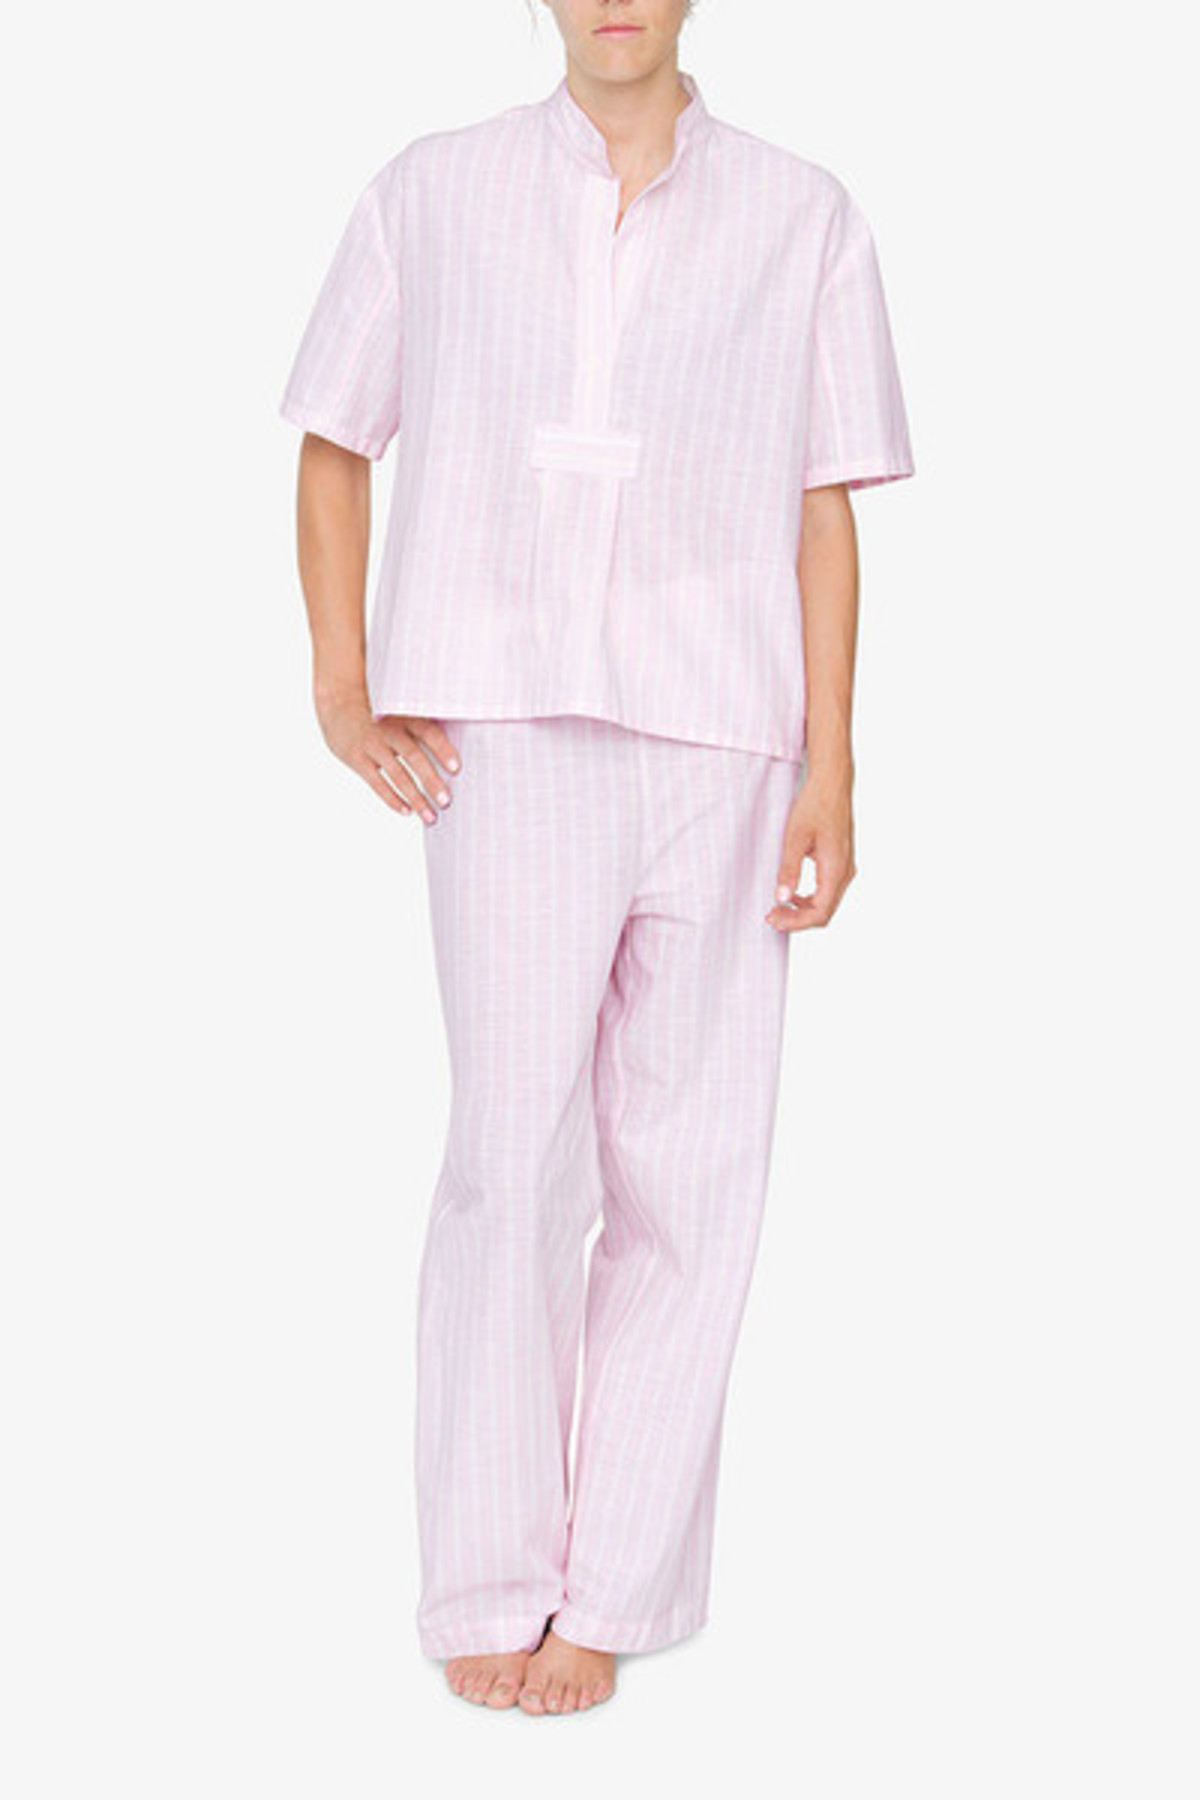 89d8eccd52 Rebecca Bree x The Sleep Shirt Pajama Set